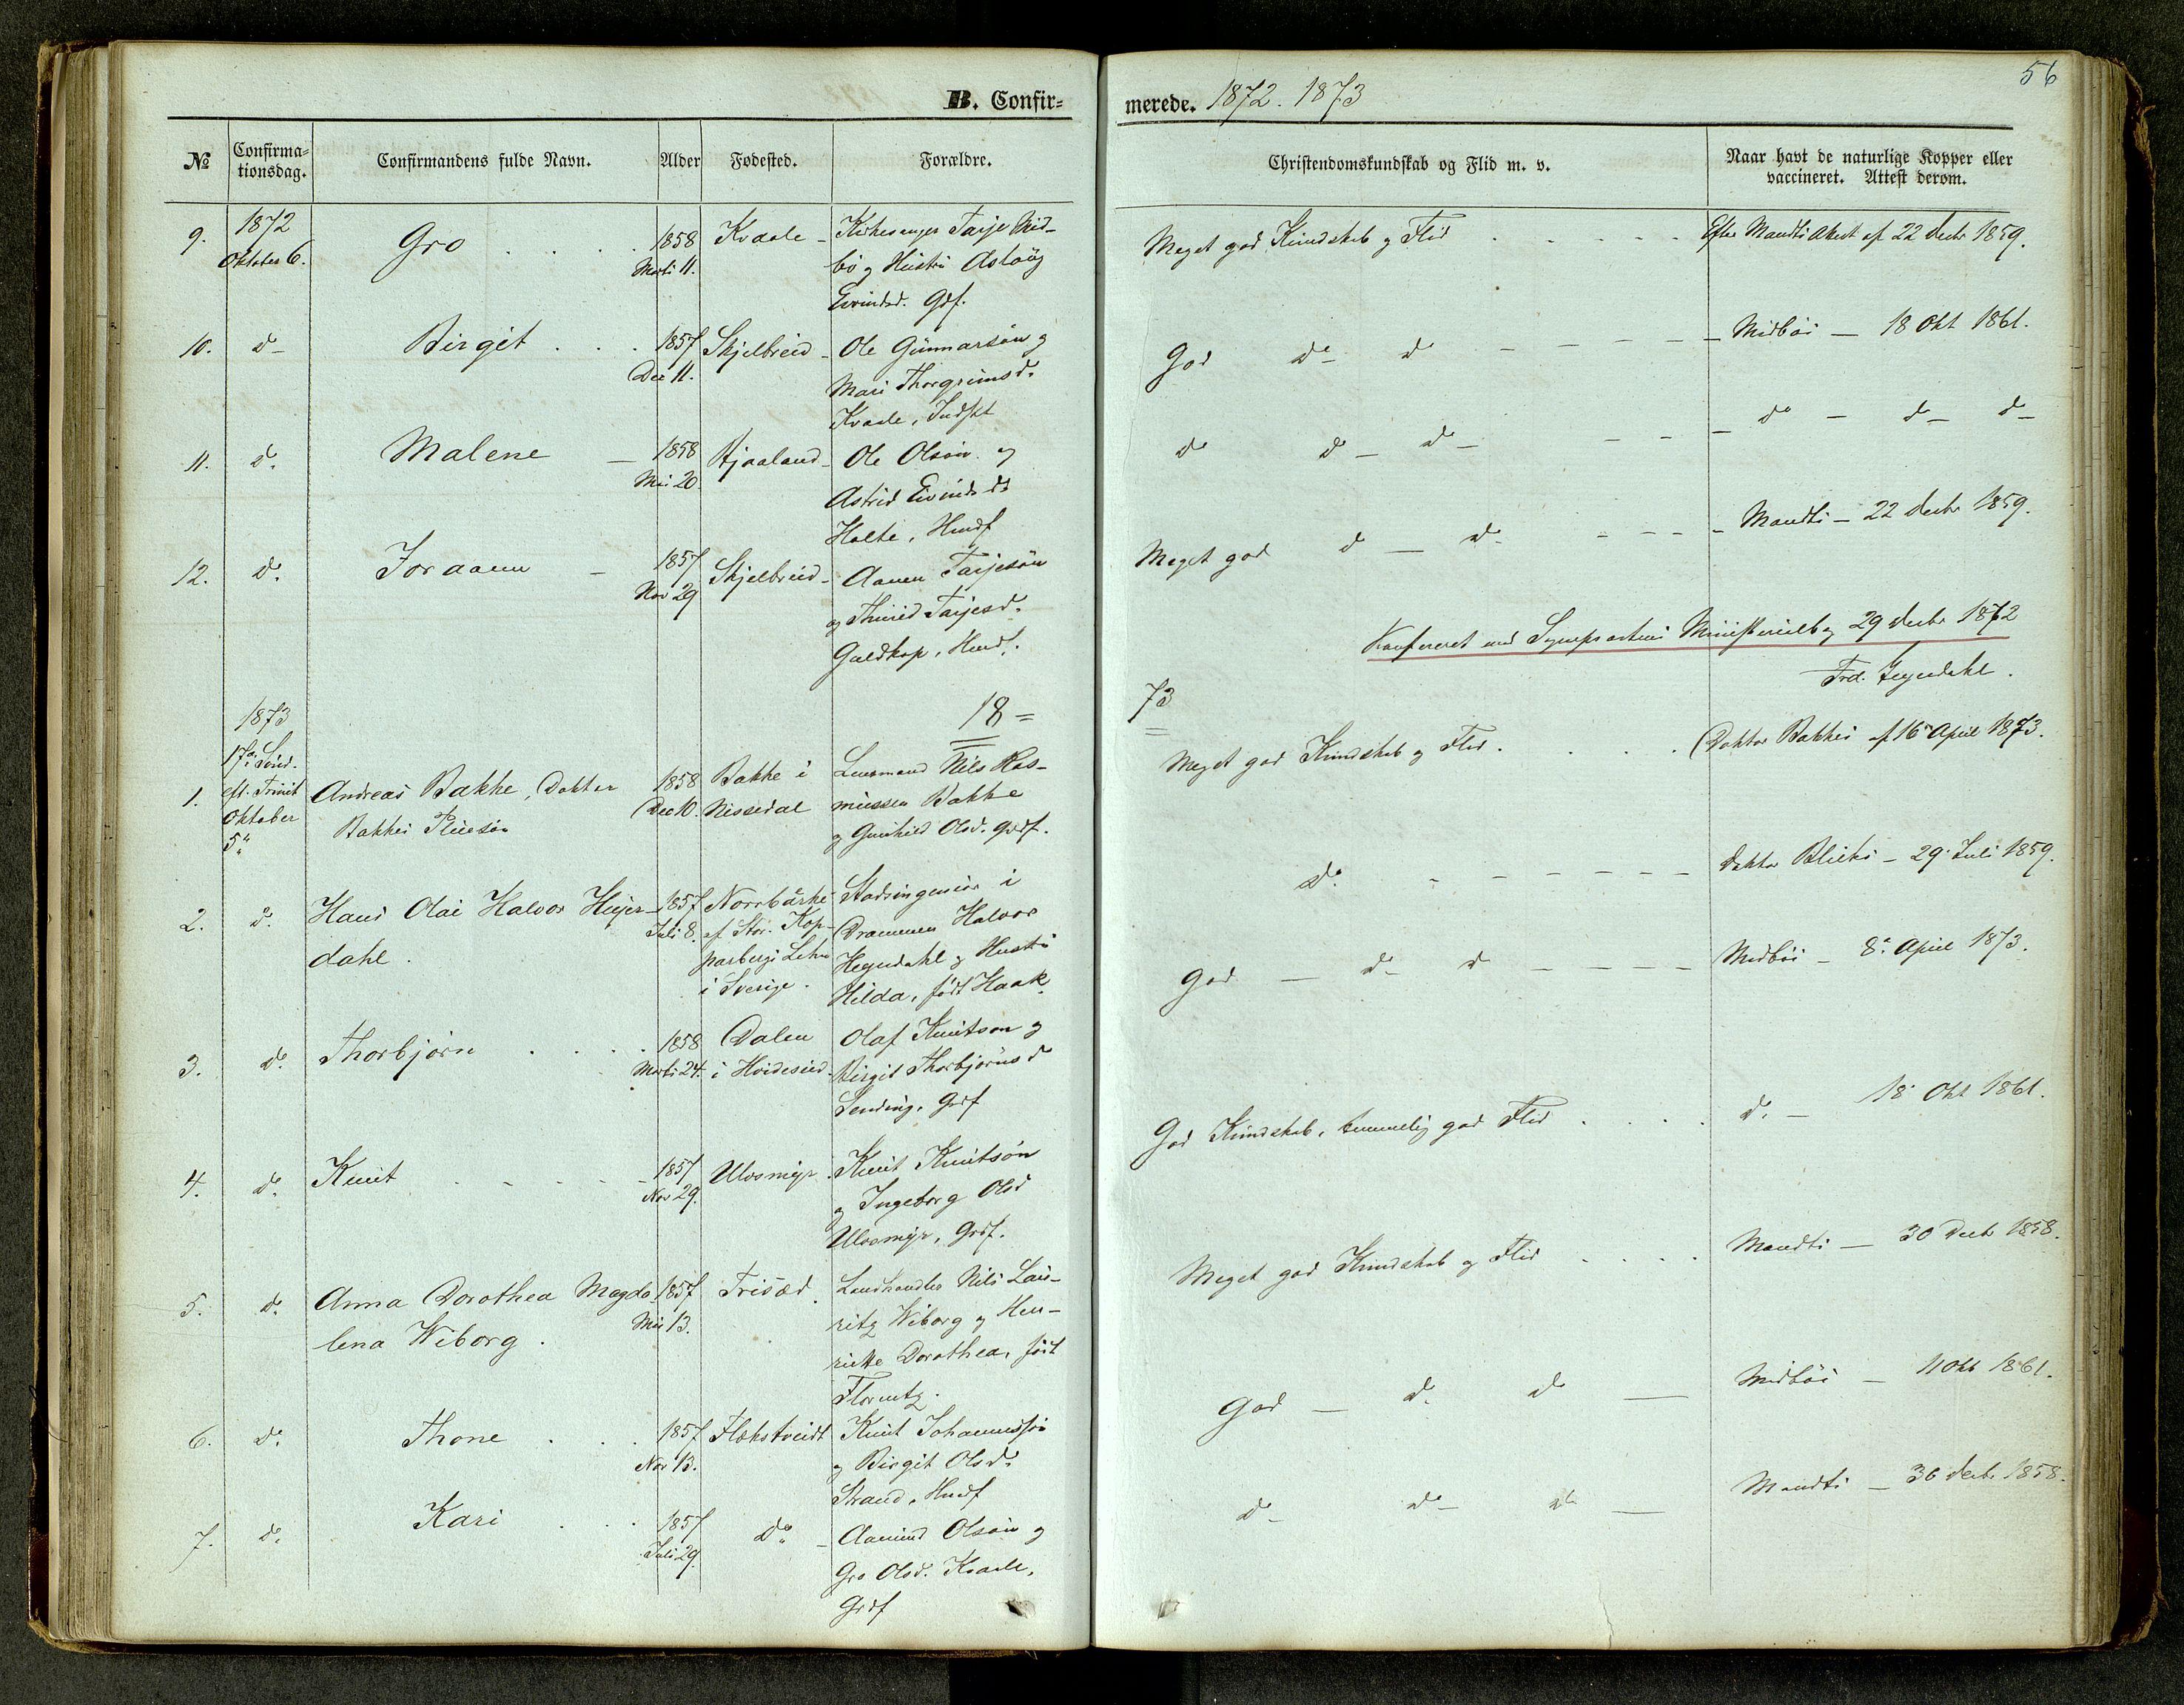 SAKO, Lårdal kirkebøker, G/Ga/L0002: Klokkerbok nr. I 2, 1861-1890, s. 56